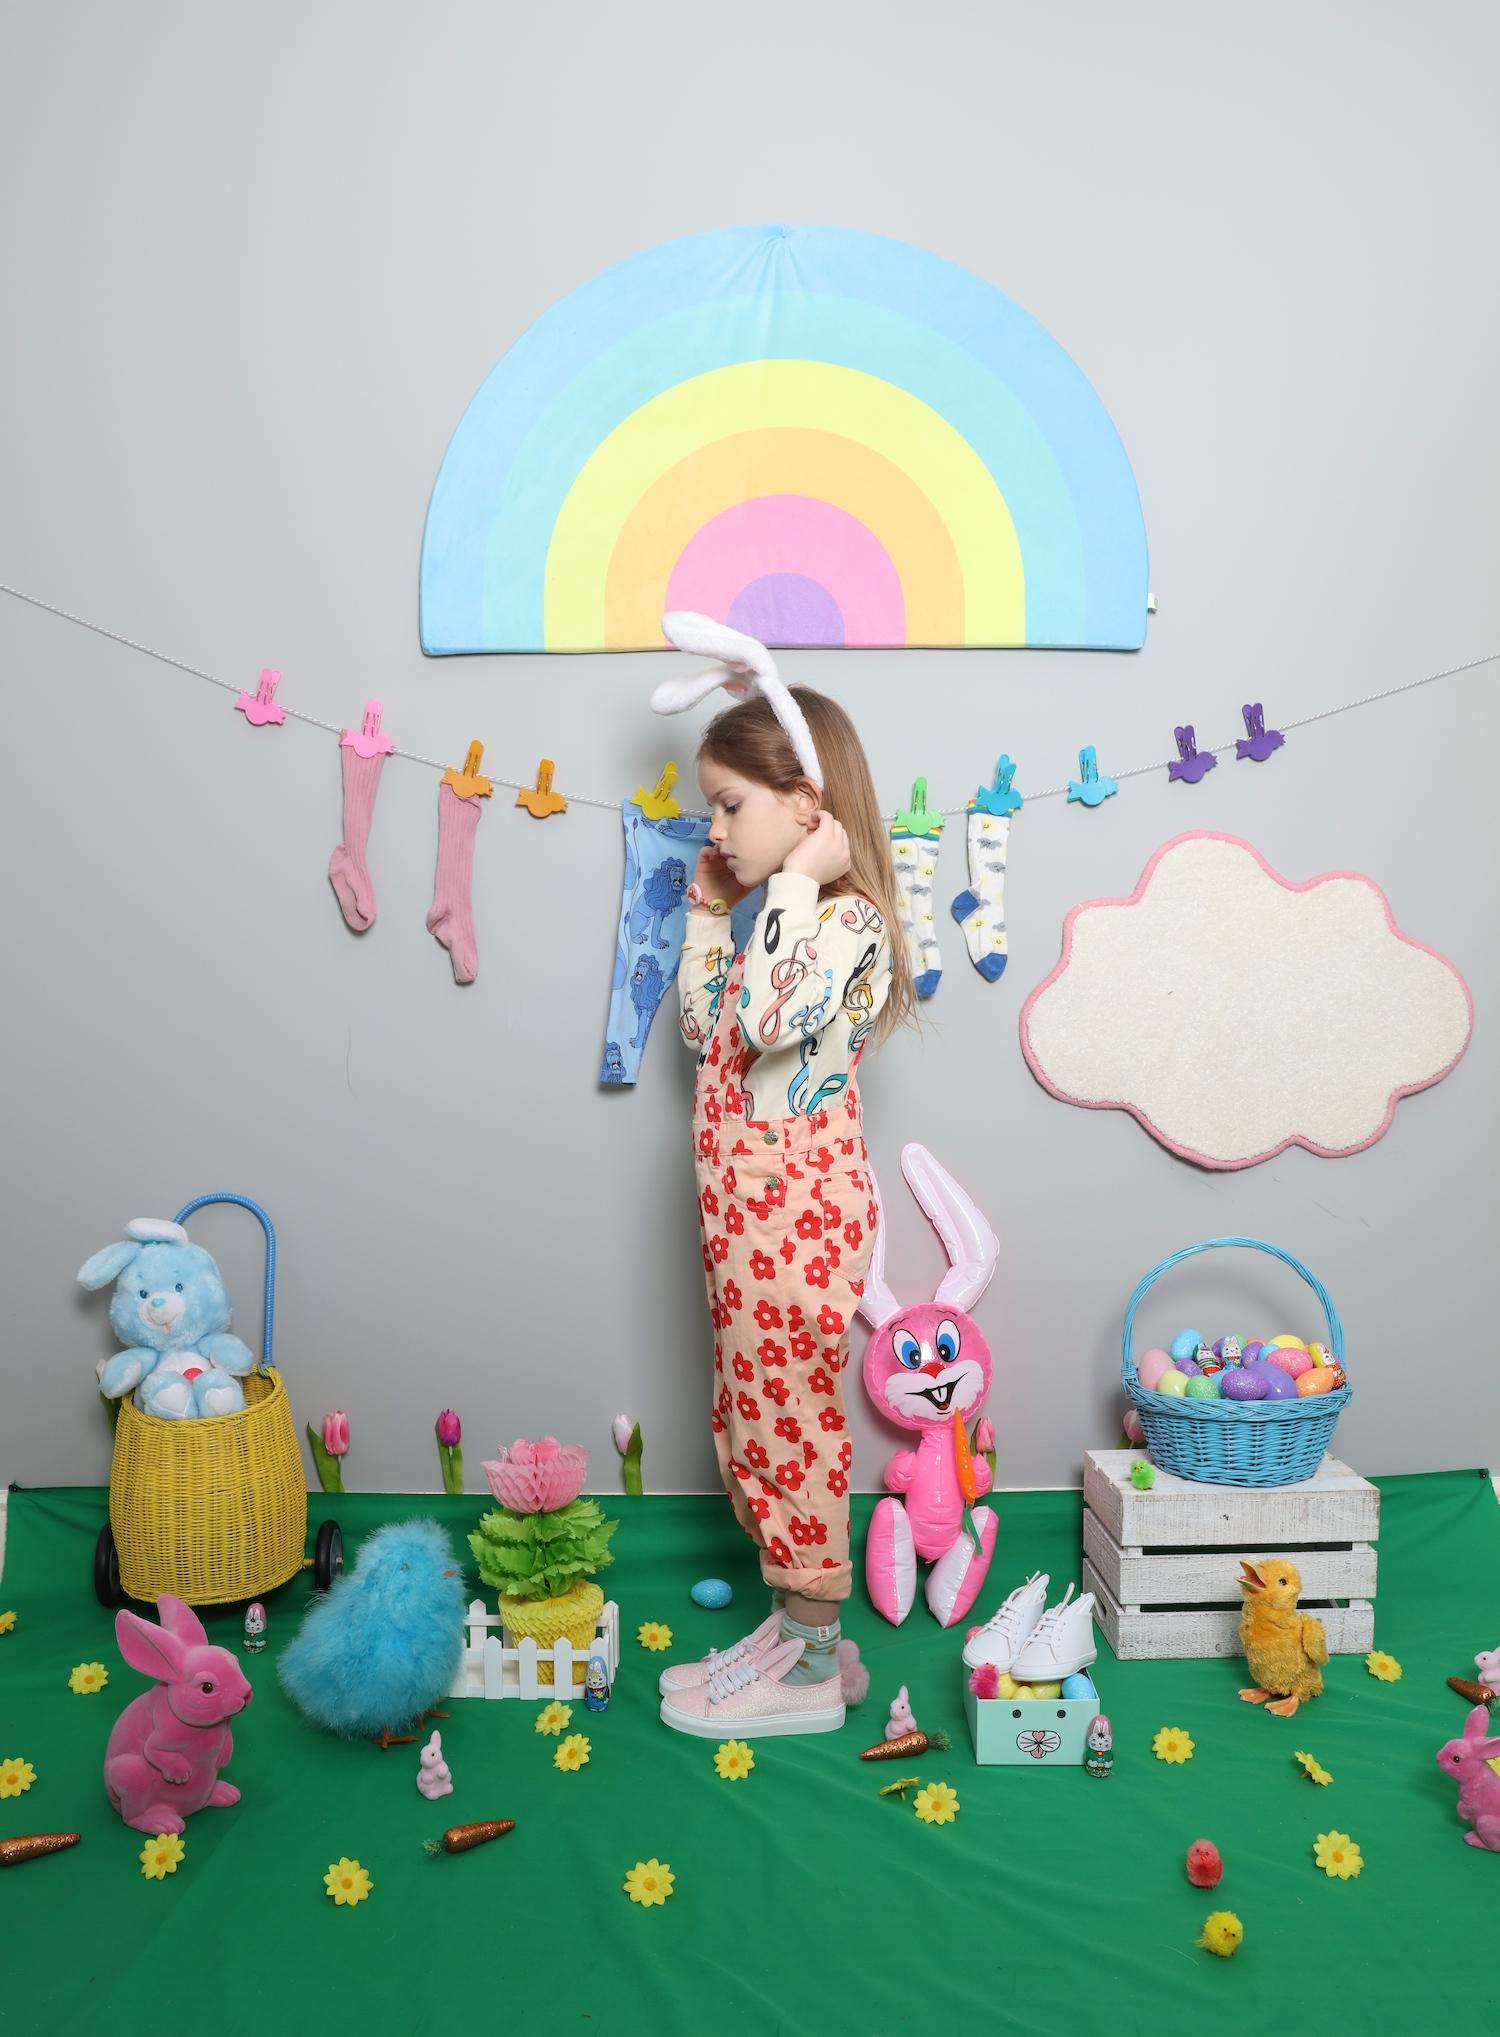 minna_parikka_children_salon_mini_rodini_easter_bunny